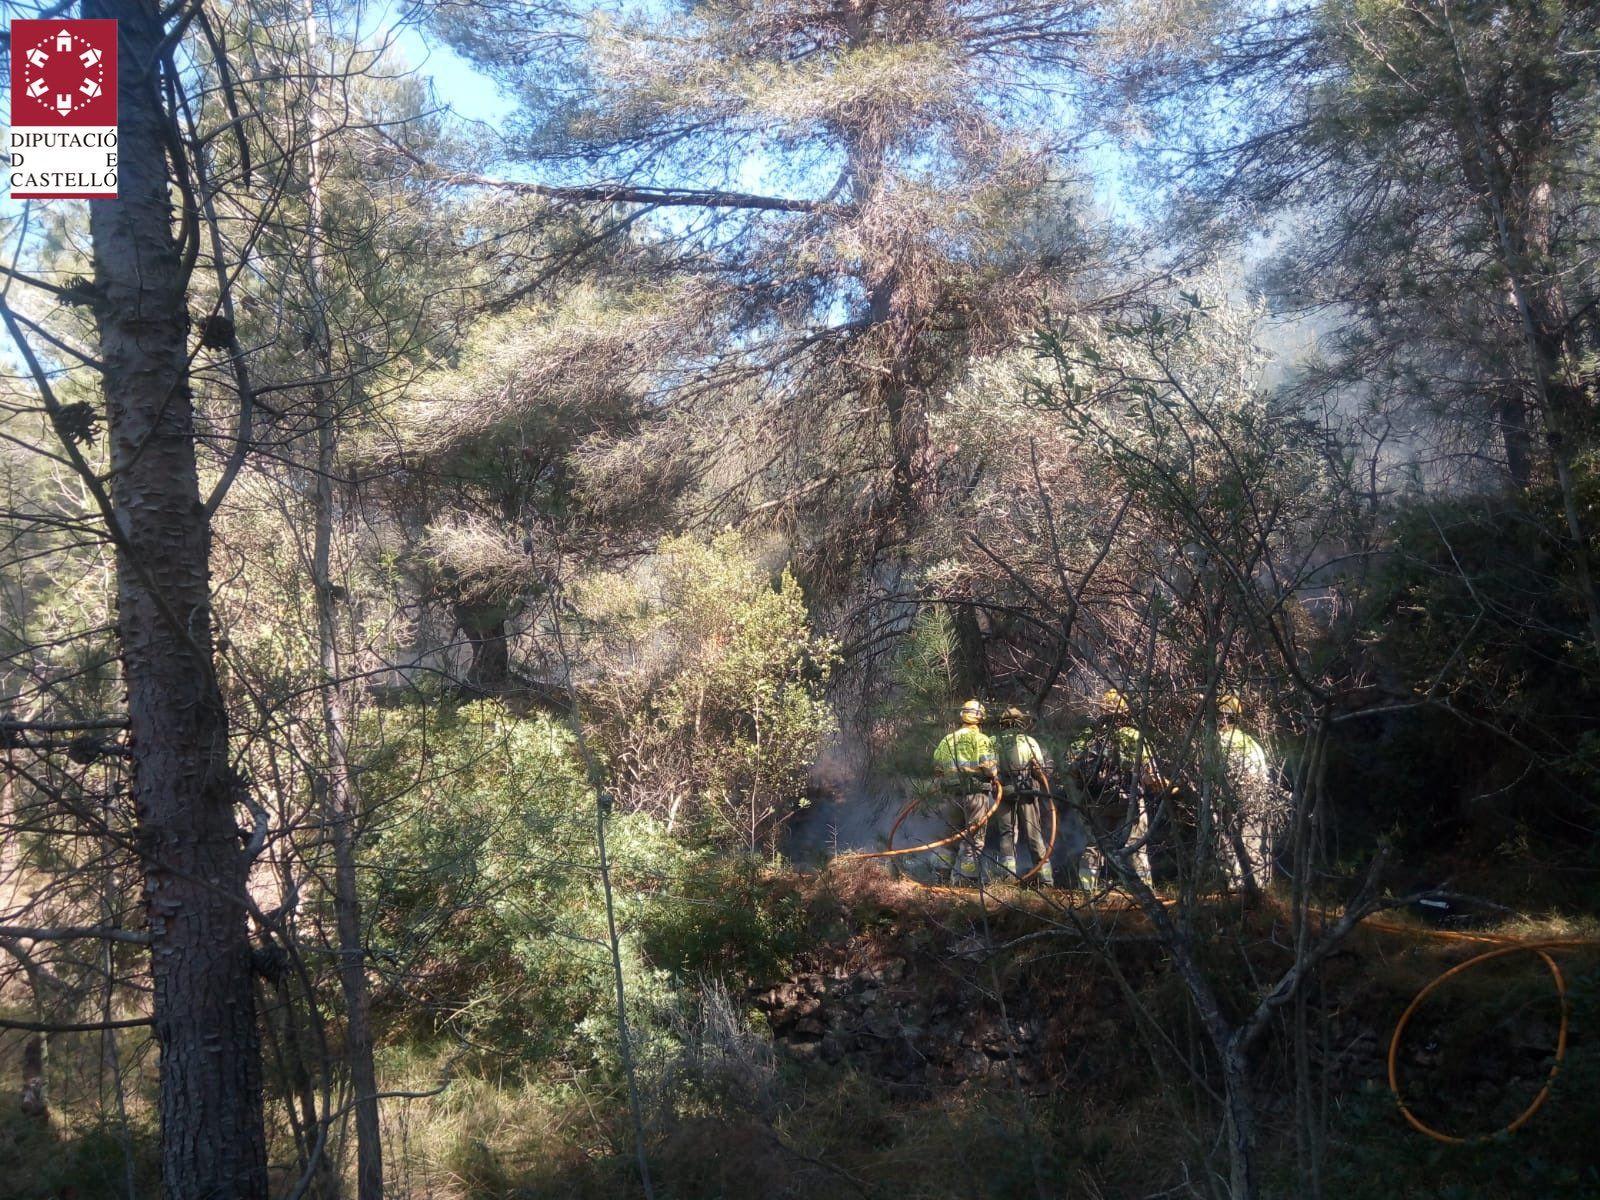 Fotos del incendio forestal en Sant Joan de Moró